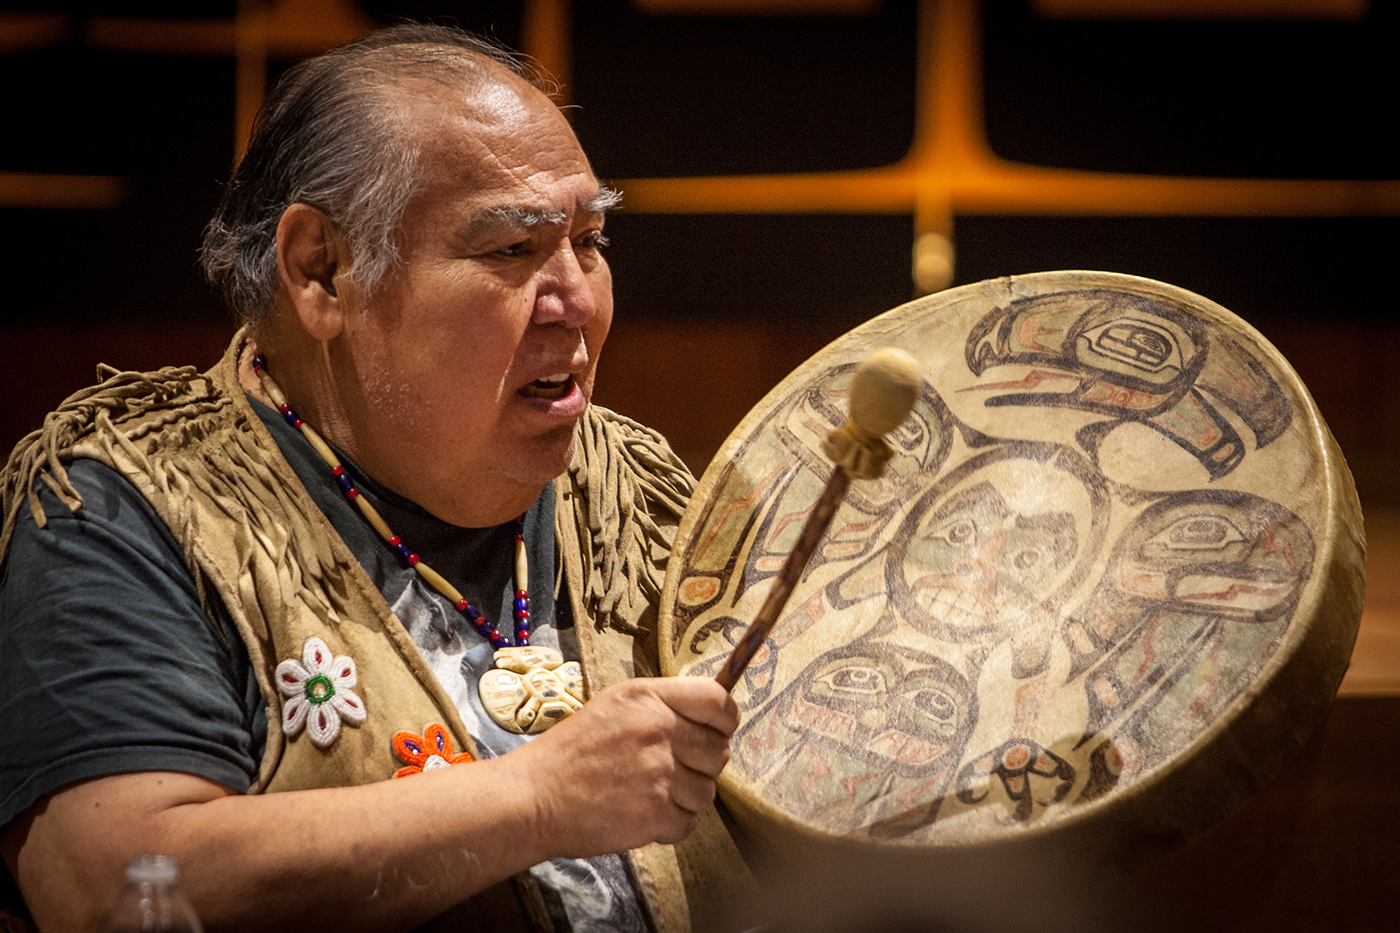 David Katzeek, photo credit Sealaska Heritage Institute